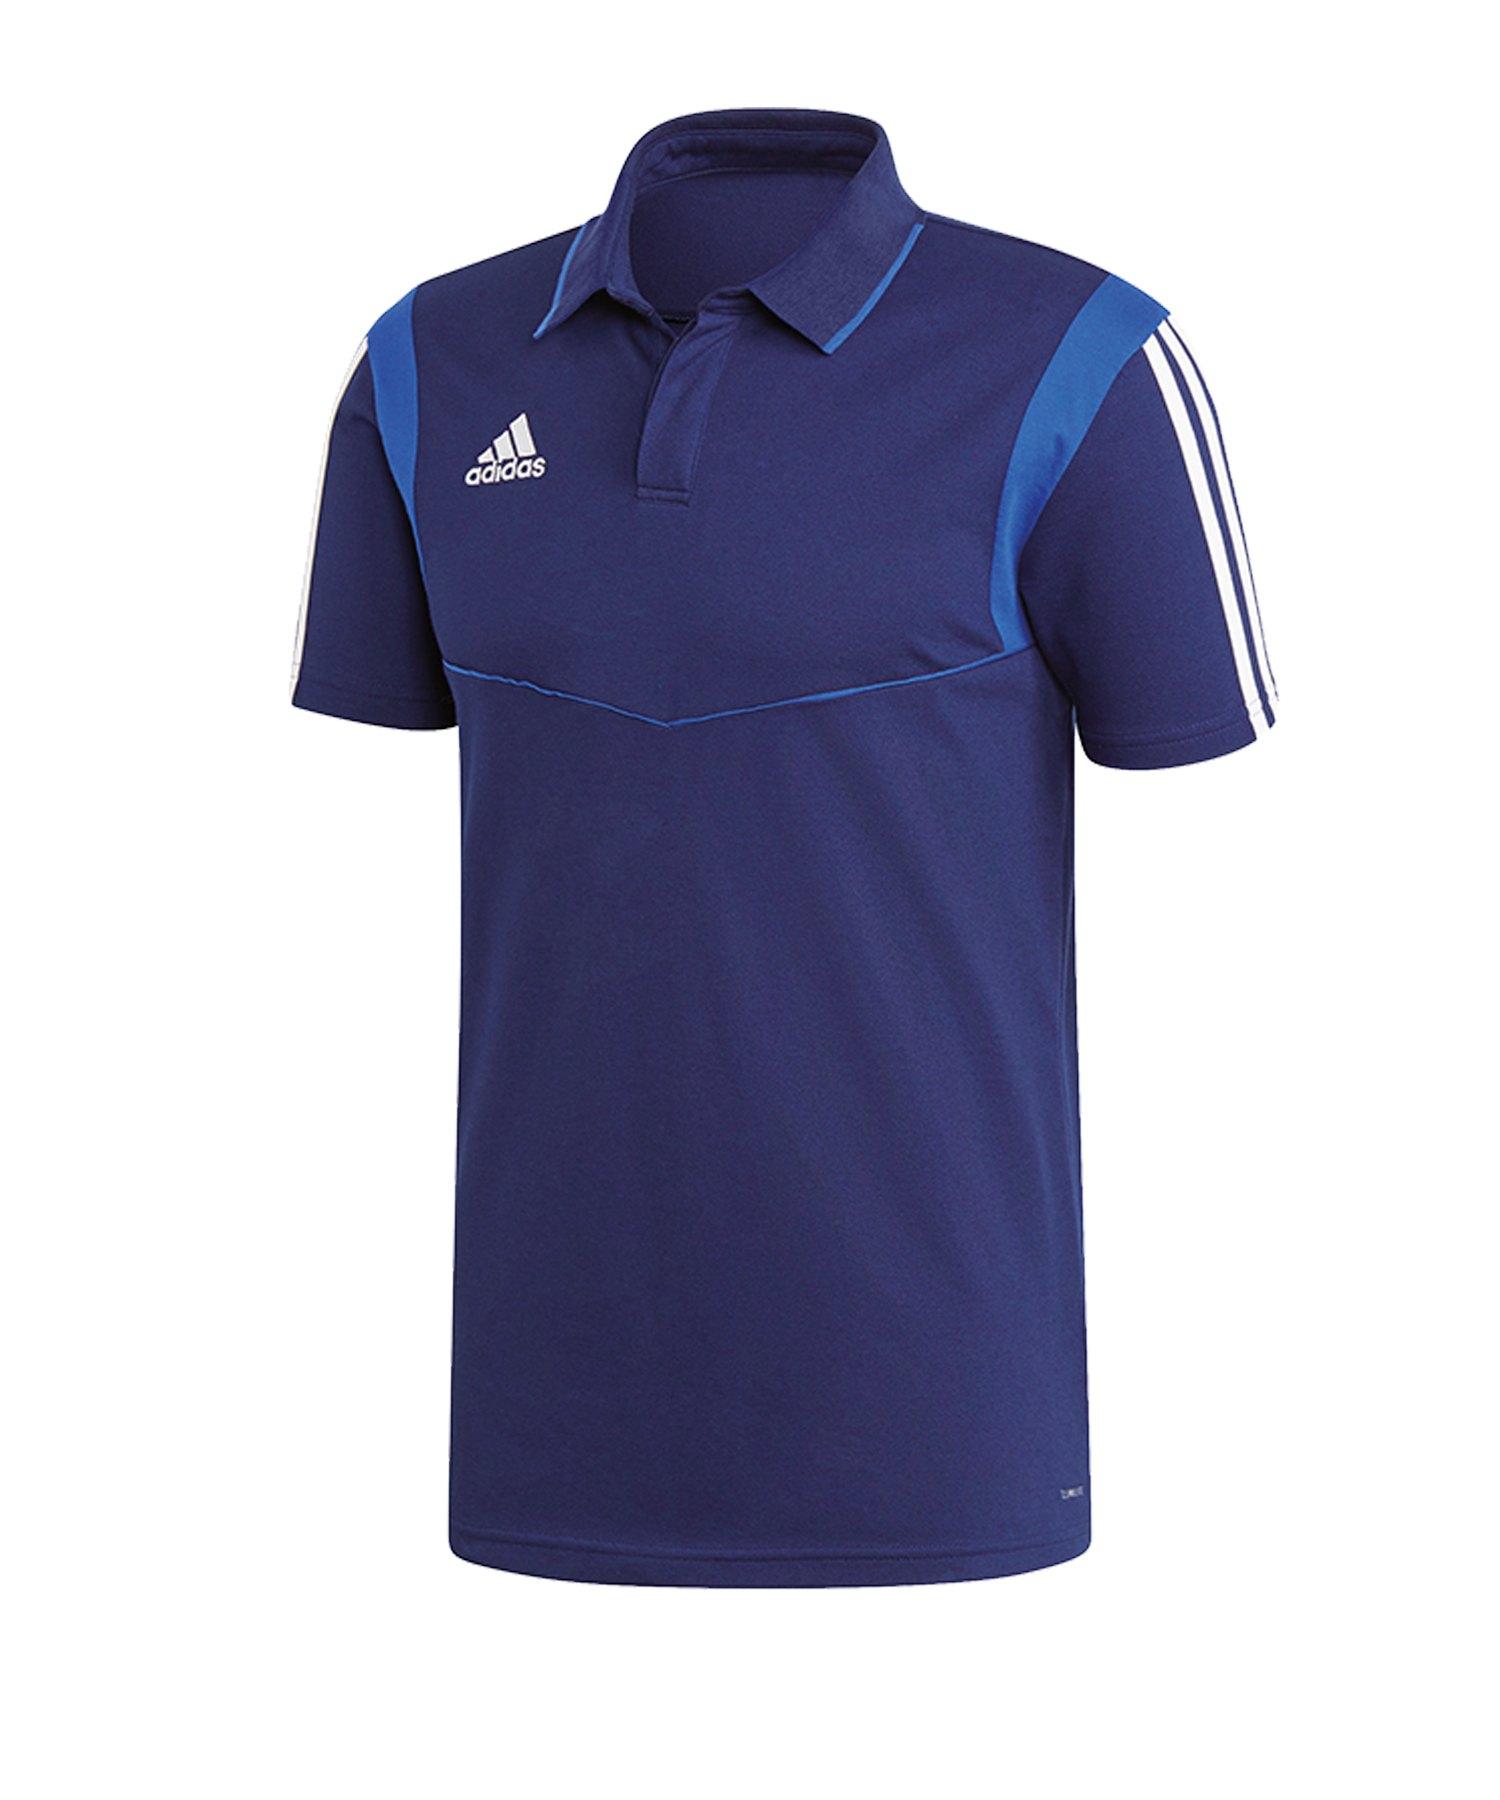 adidas Tiro 19 Poloshirt Dunkelblau - blau